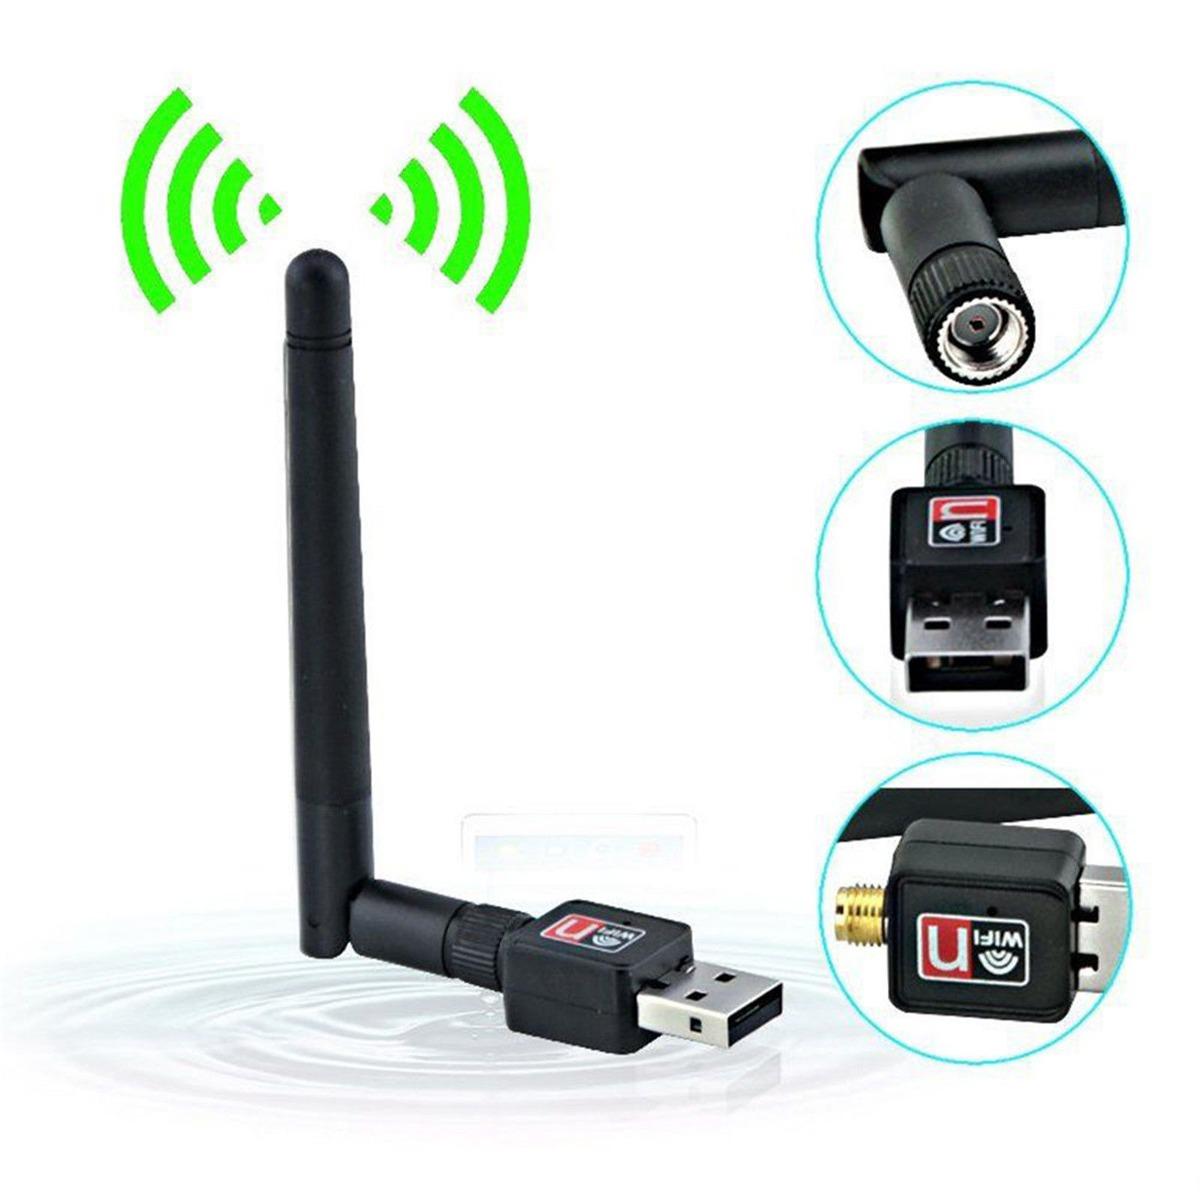 Adaptador Wifi Usb 900mbps Antena 802.iin 802-1 Wireless